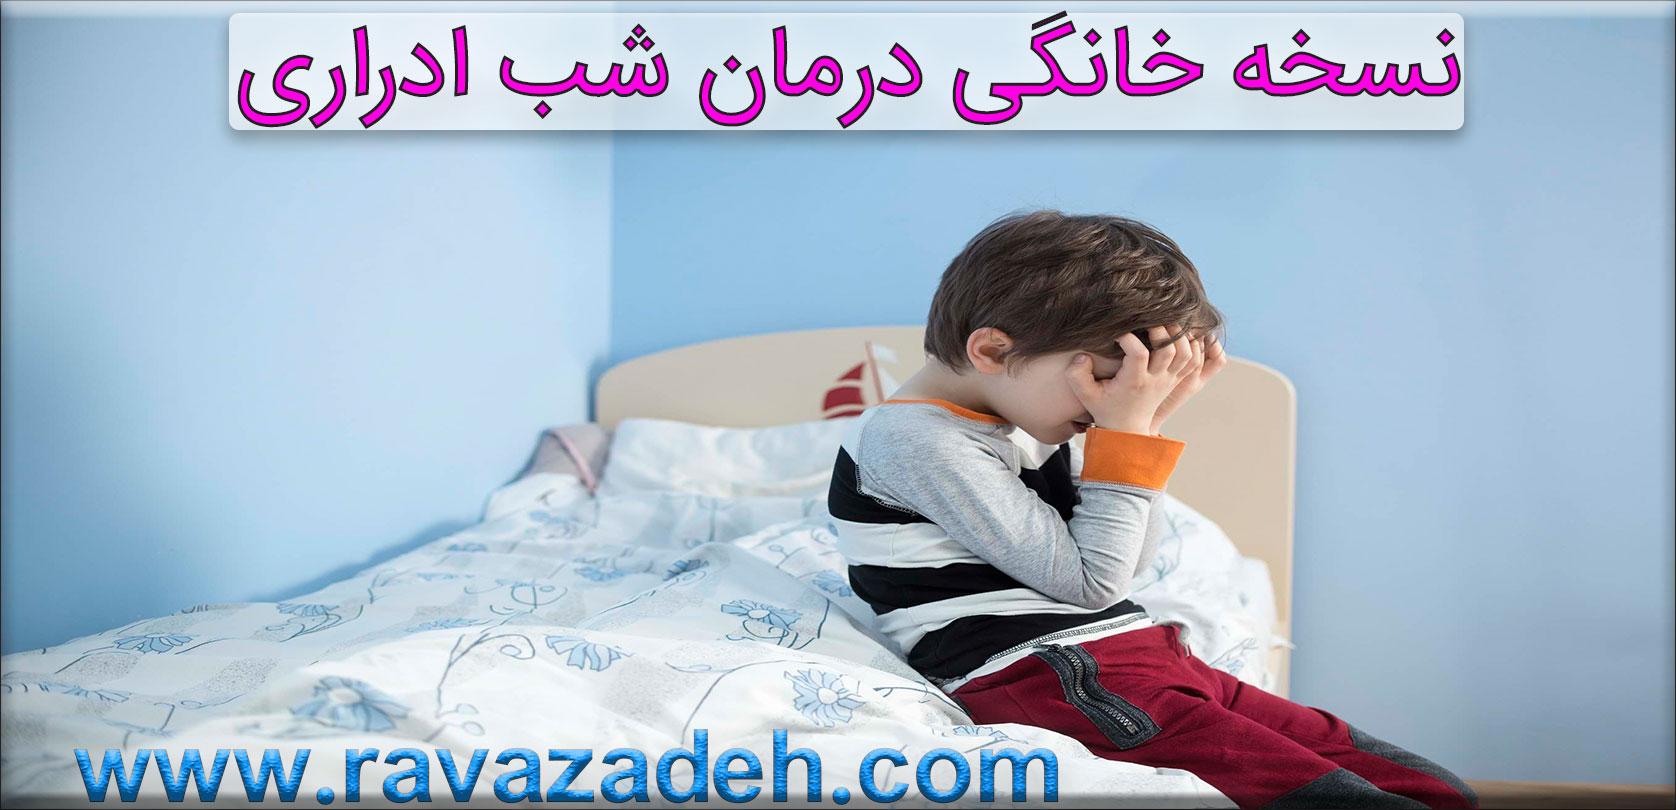 Photo of توصیه بهداشتی: نسخه خانگی درمان شب ادراری